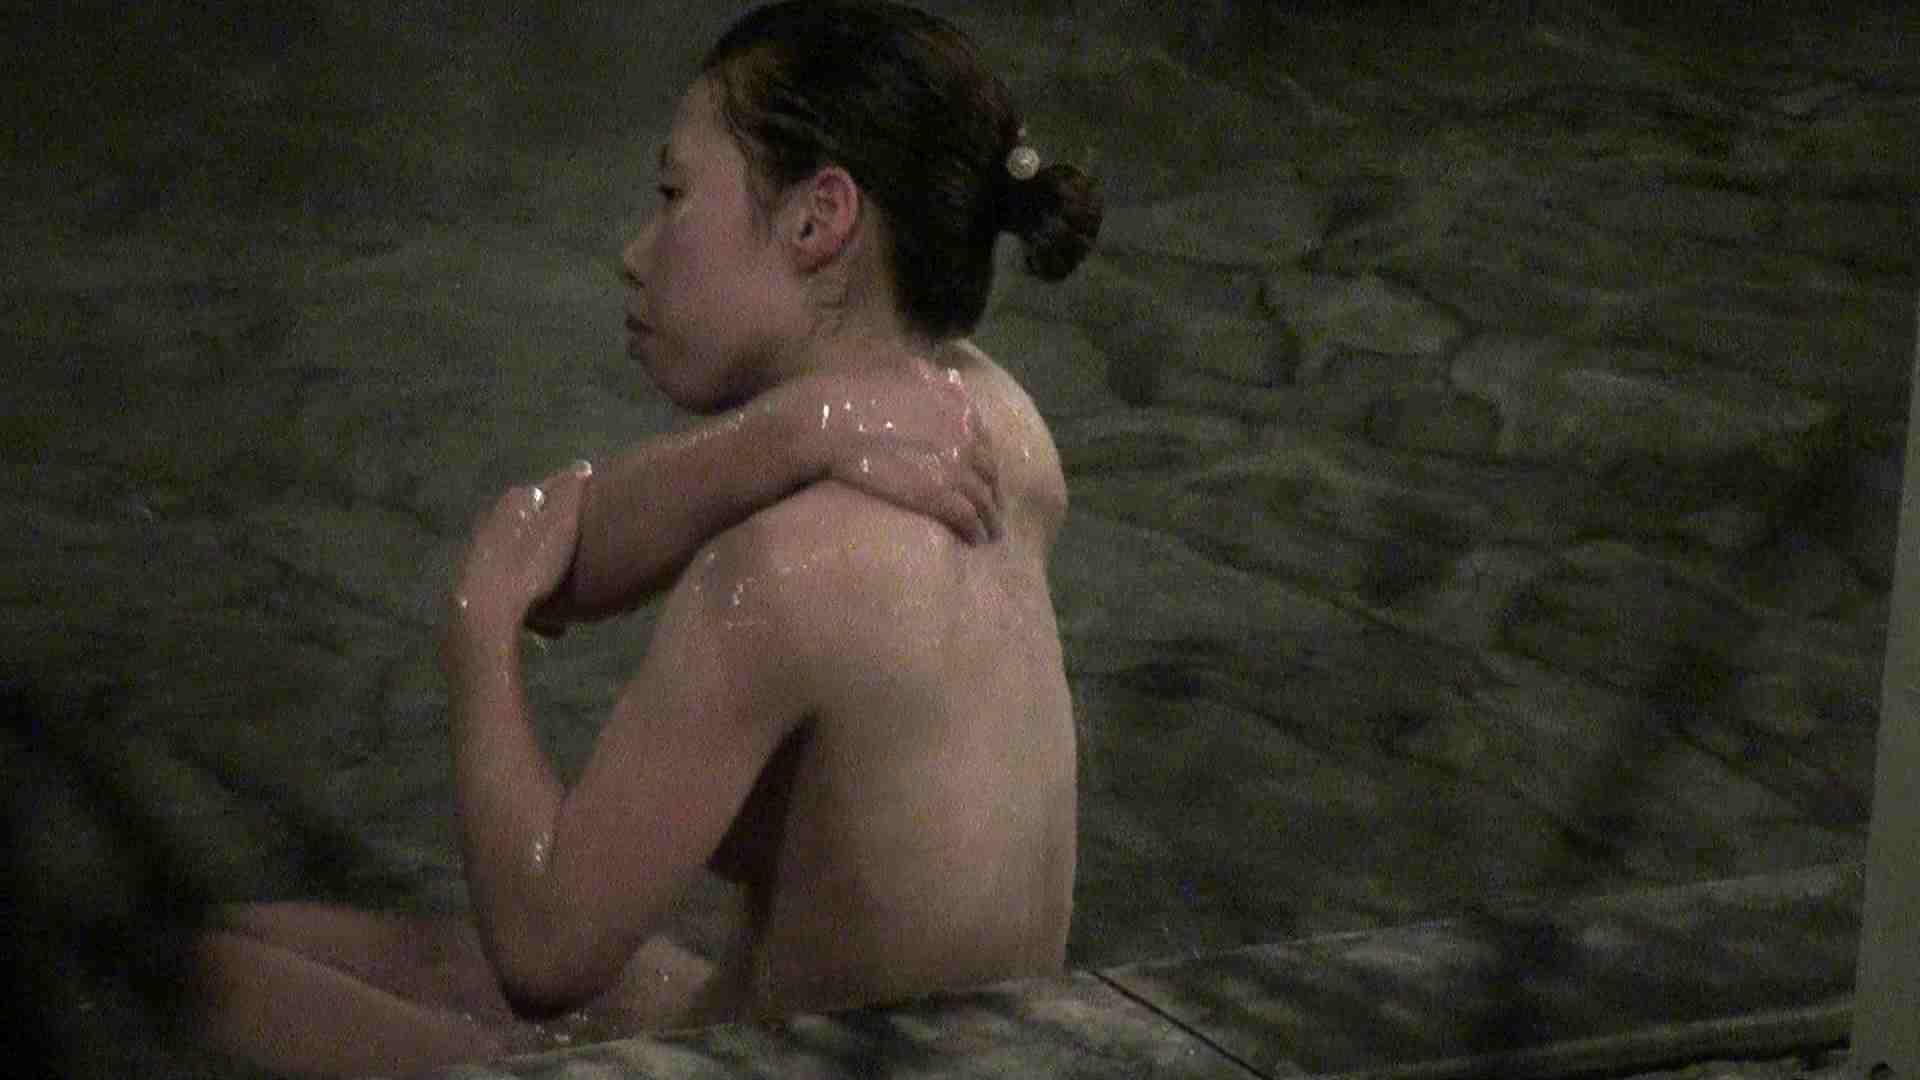 Aquaな露天風呂Vol.391 美しいOLの裸体 えろ無修正画像 99pic 68